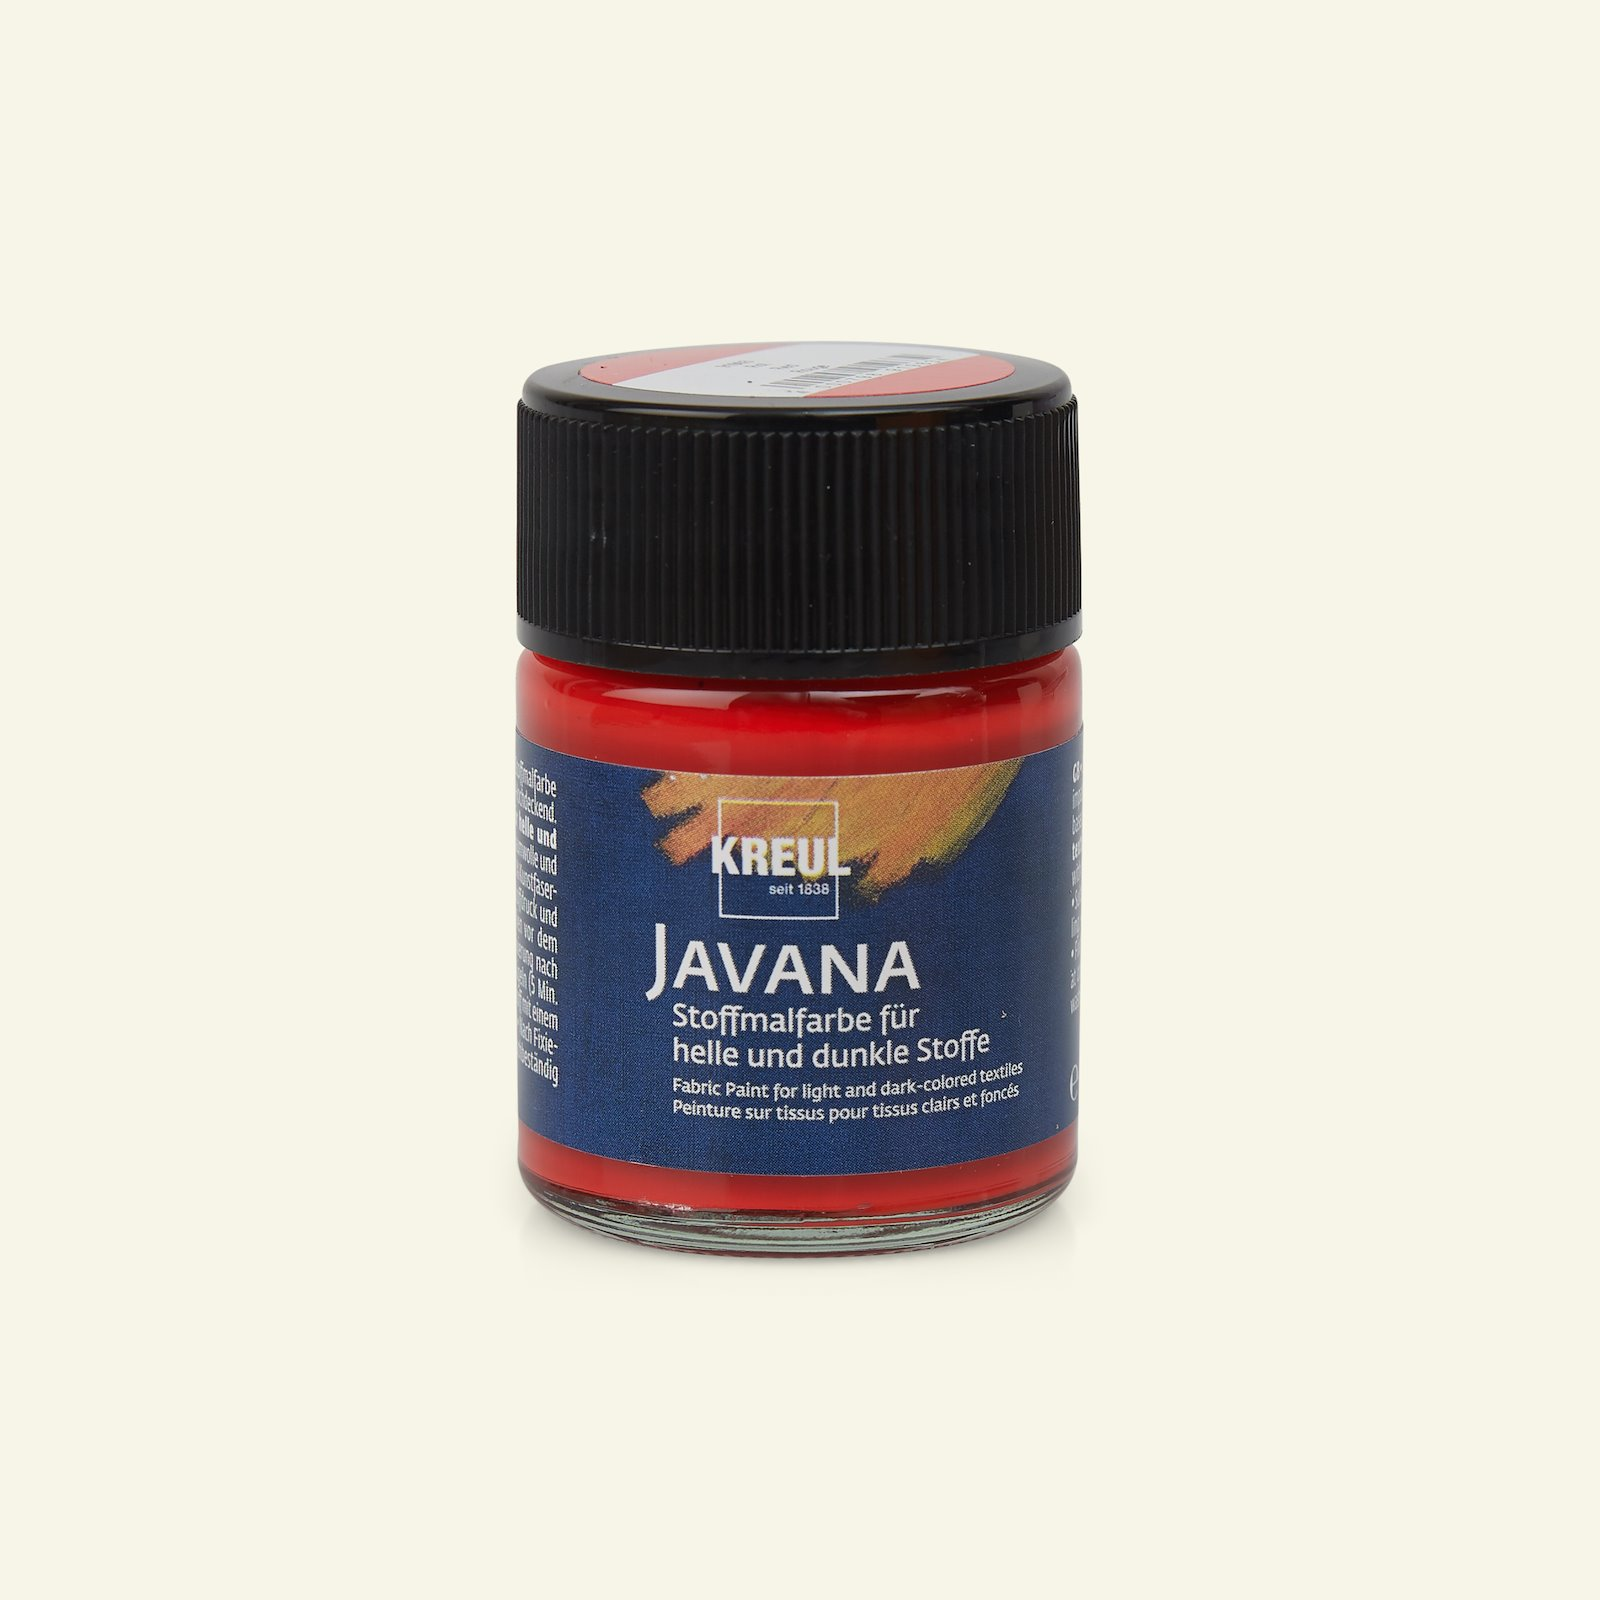 Javana opaque fabric paint red 50ml 29575_pack_b